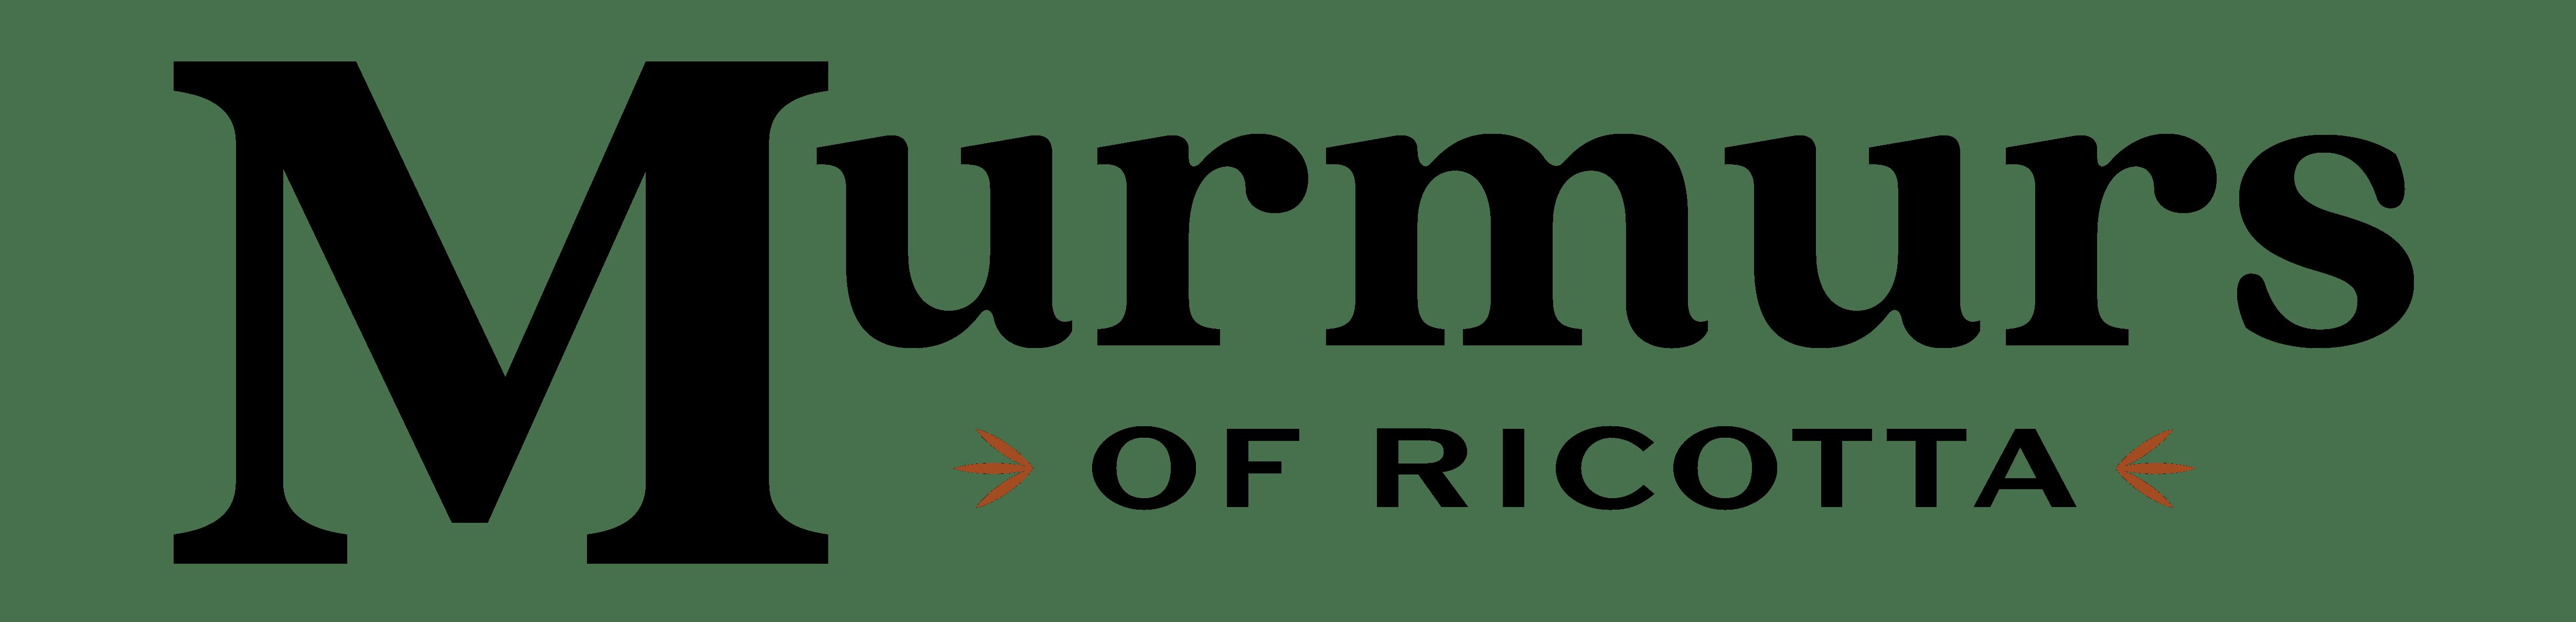 Murmurs of Ricotta